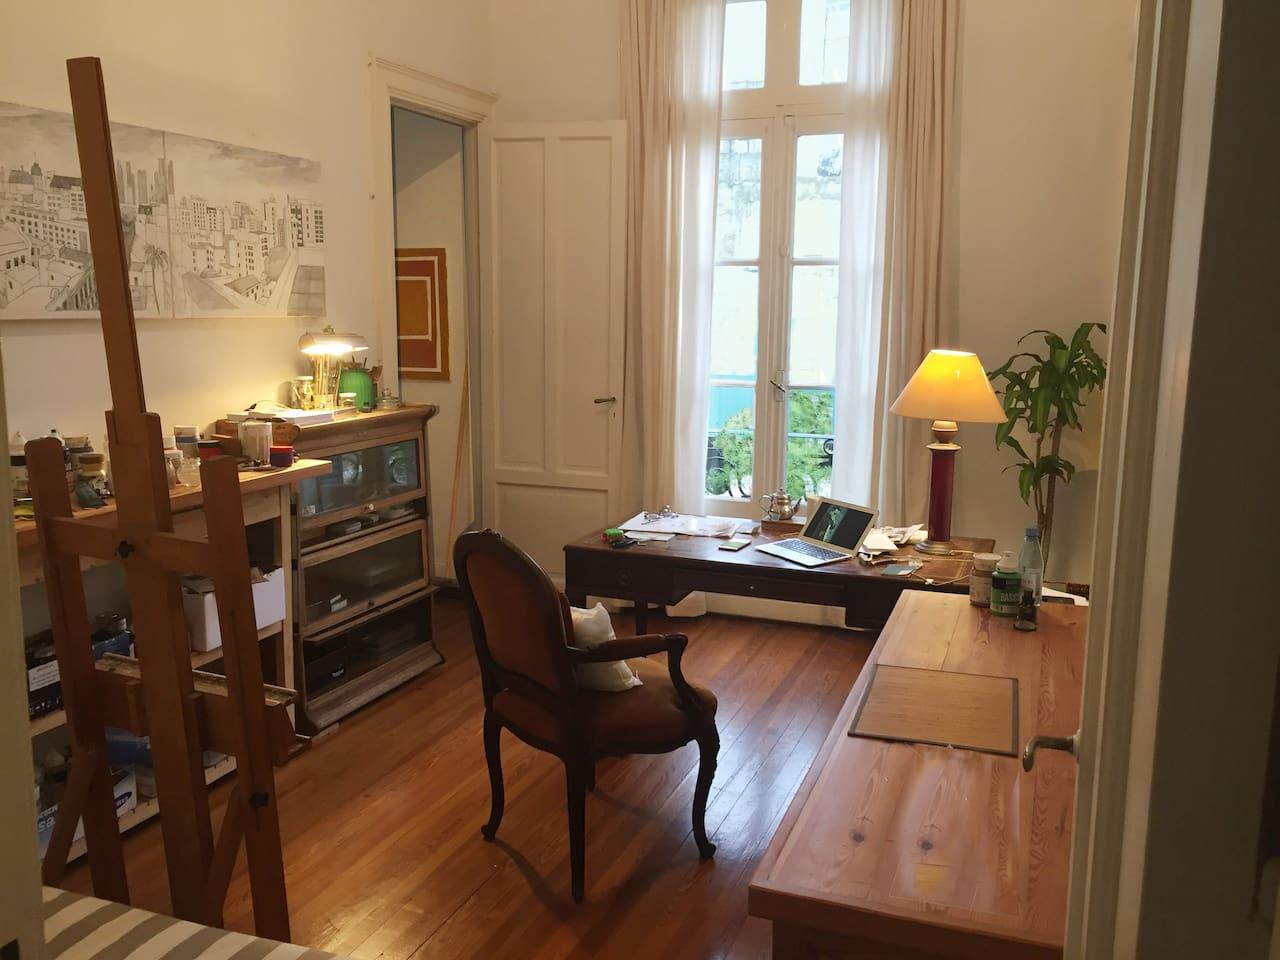 Escritorio - Desk